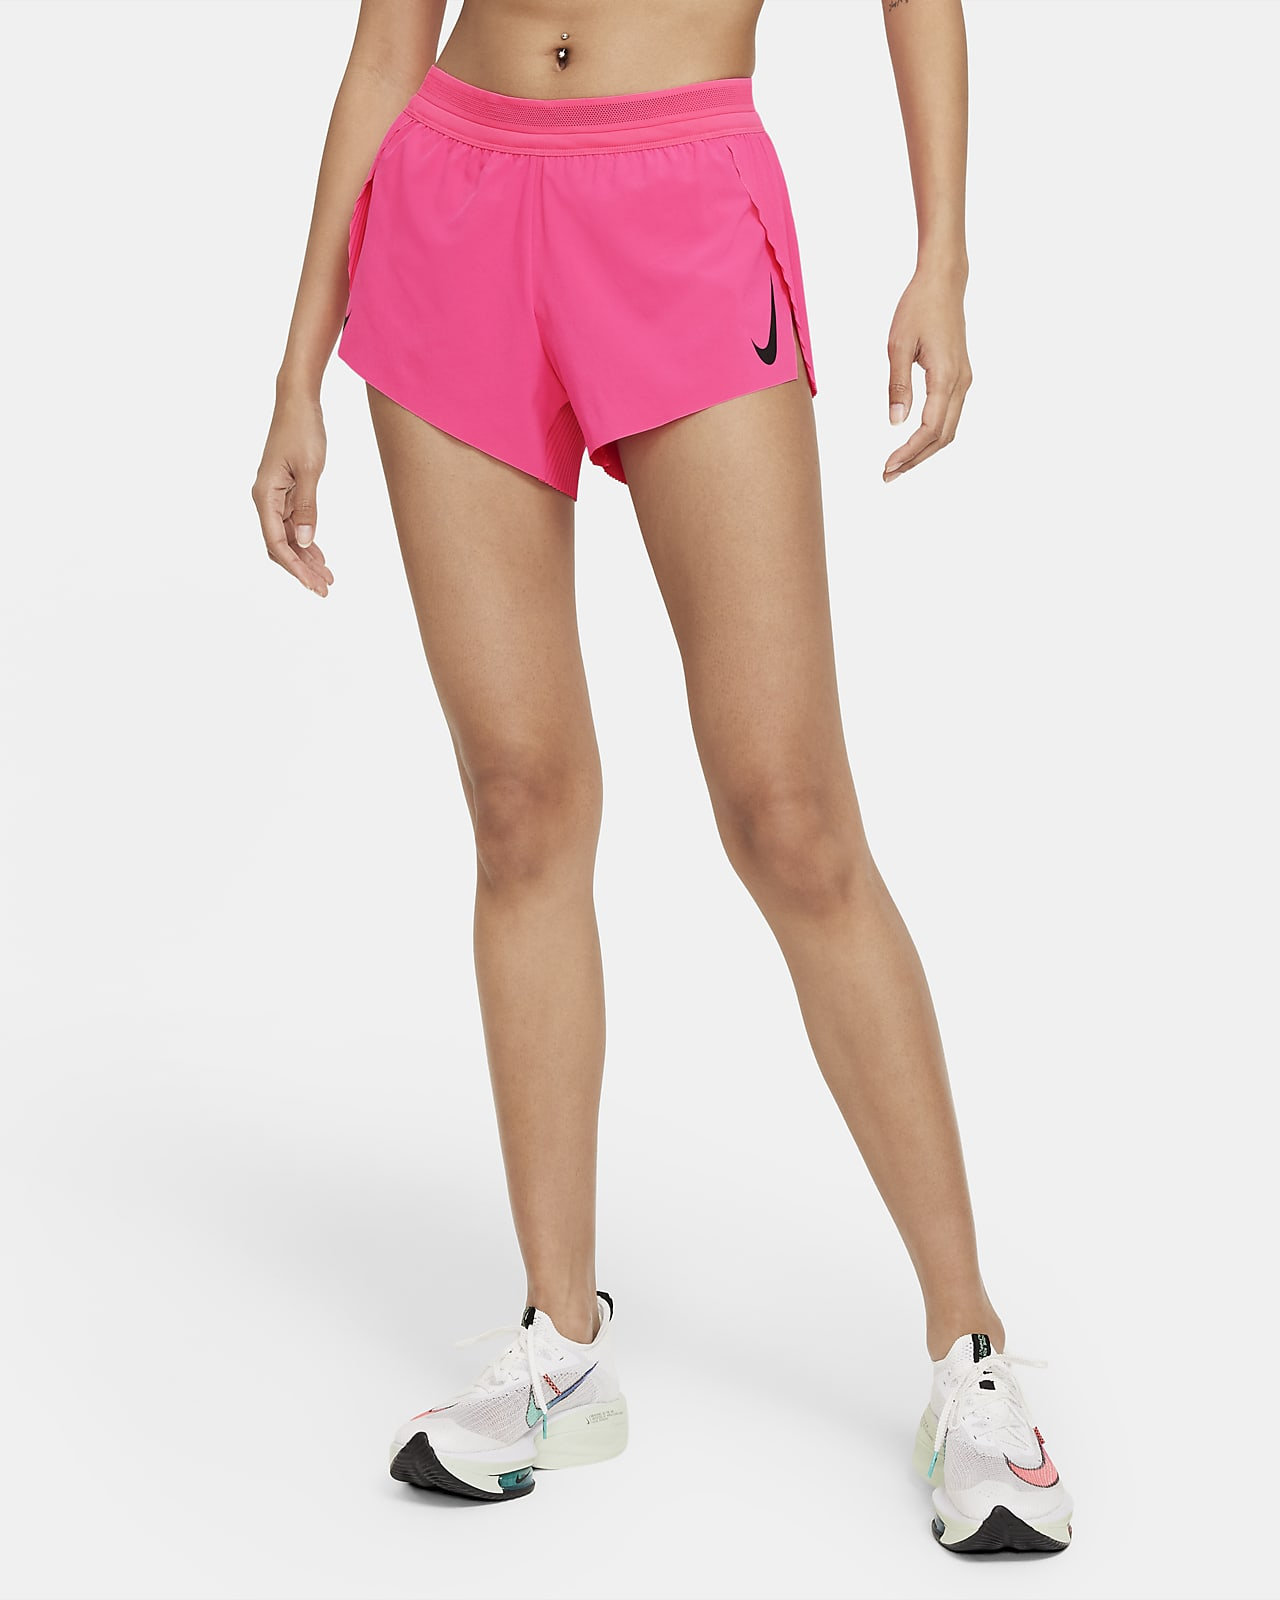 Женские беговые шорты Nike AeroSwift